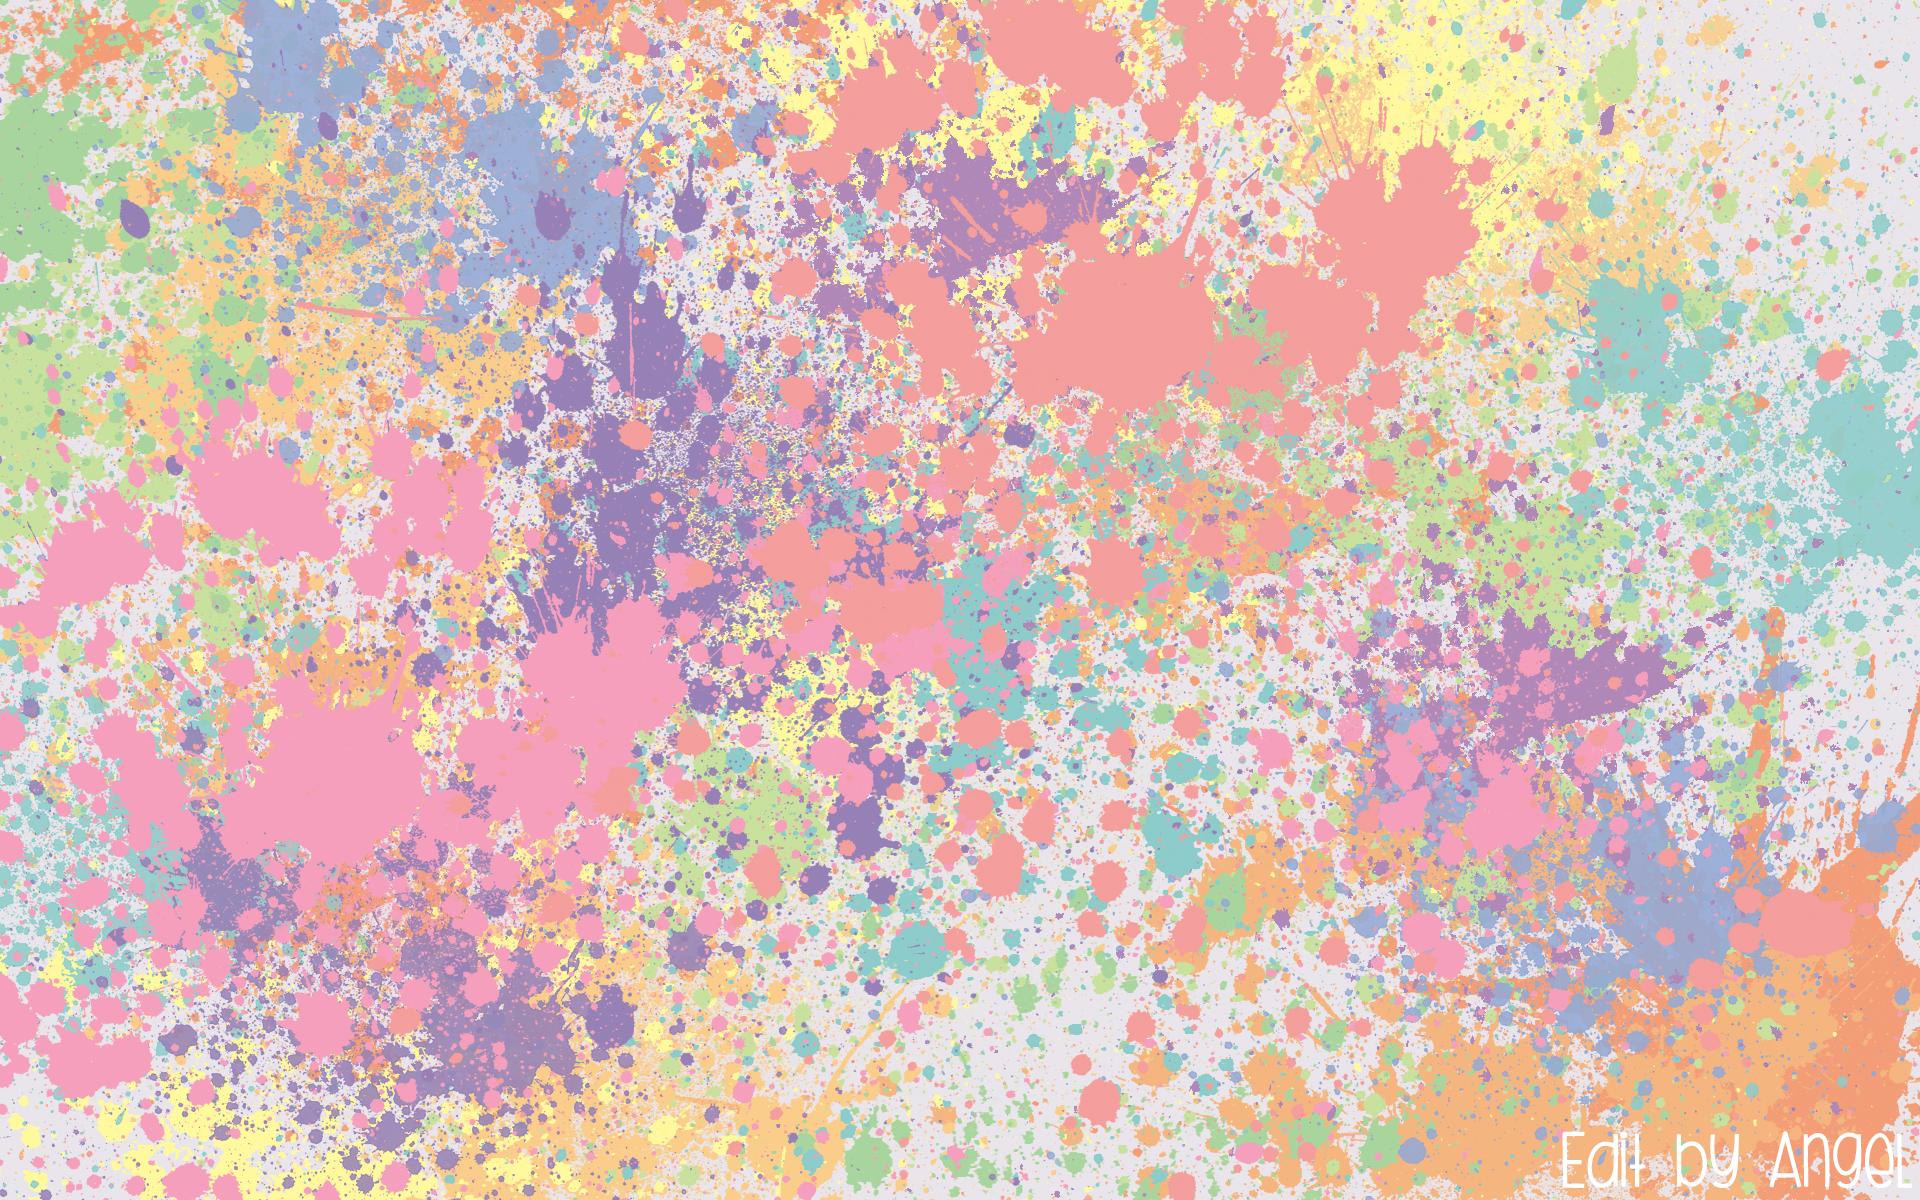 Pastel Splat Wallpaper by foolish angel 1920x1200